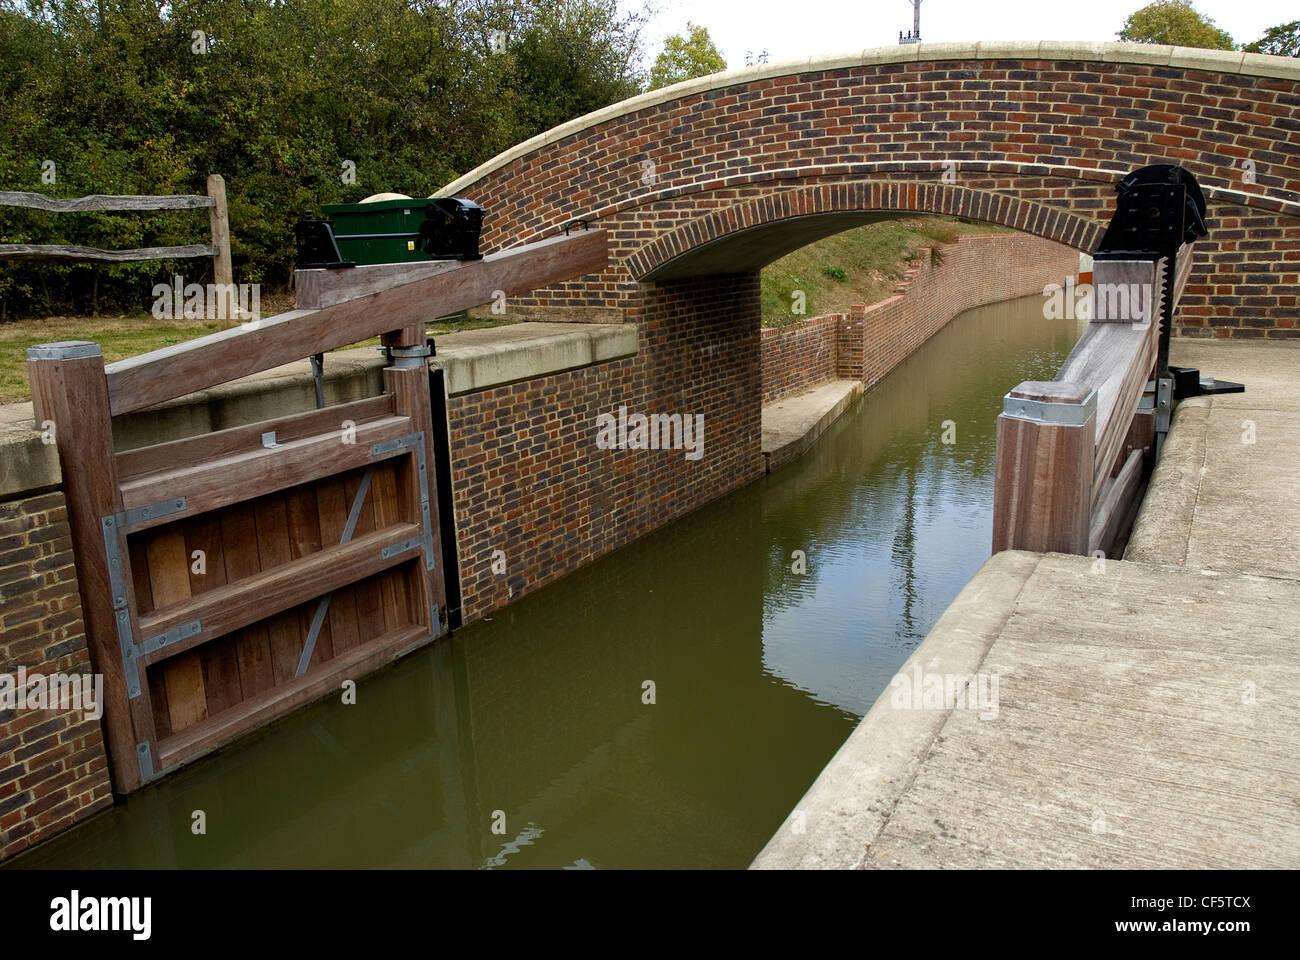 Lock On Wey Arun Canal Stock Photos & Lock On Wey Arun Canal Stock